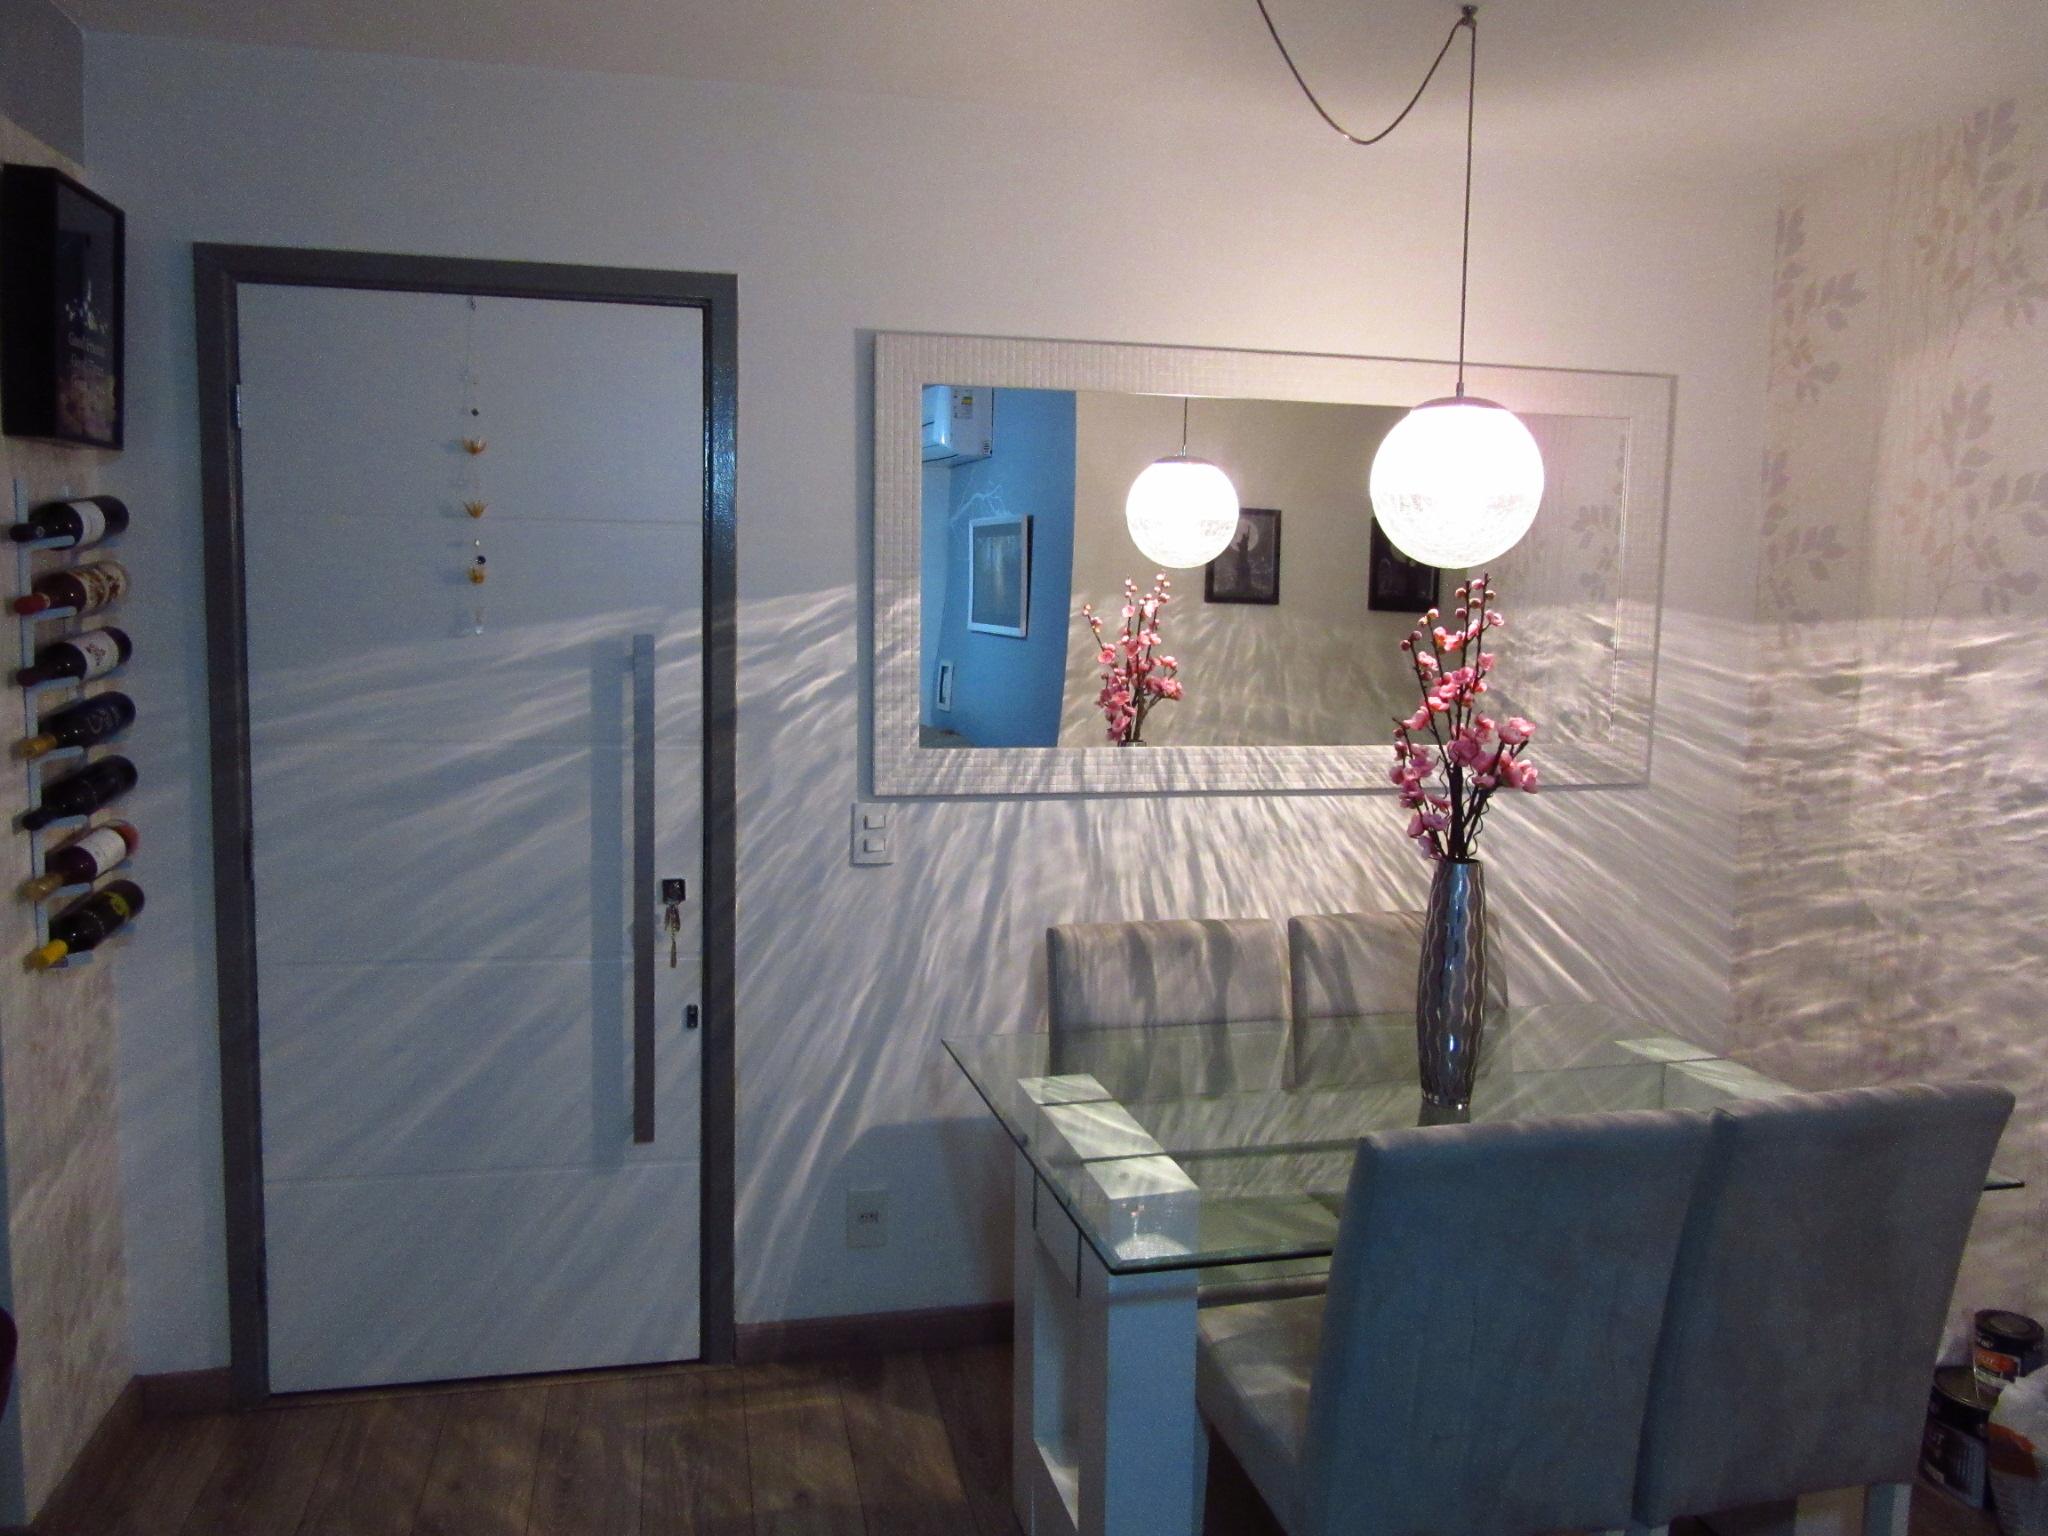 Pintura Portas Brancas A Saga Do Apartamento -> Sala Branca Com Parede Colorida